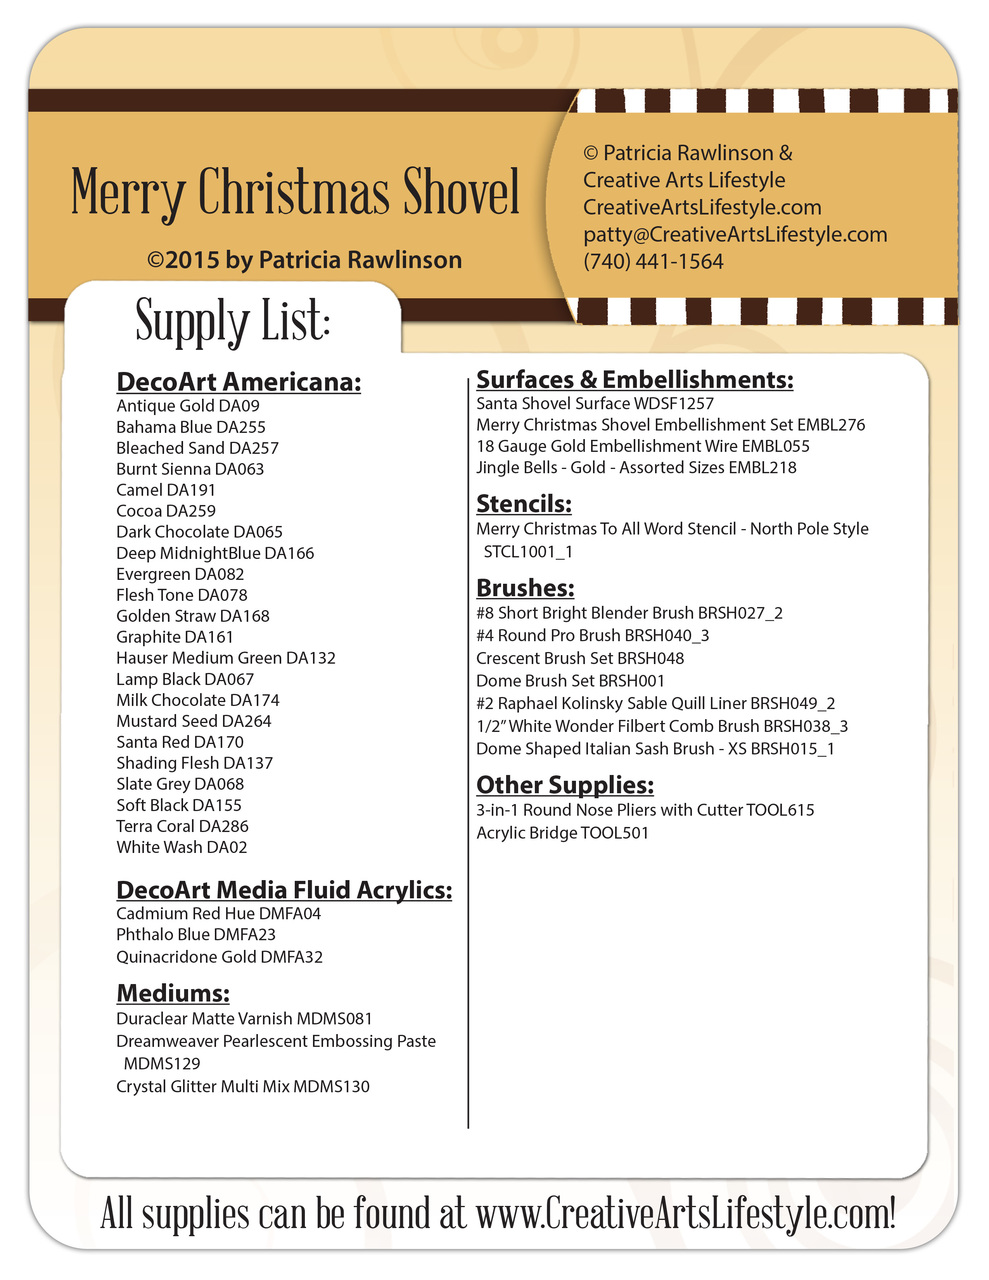 Merry Christmas Shovel - E-Packet - Patricia Rawlinson